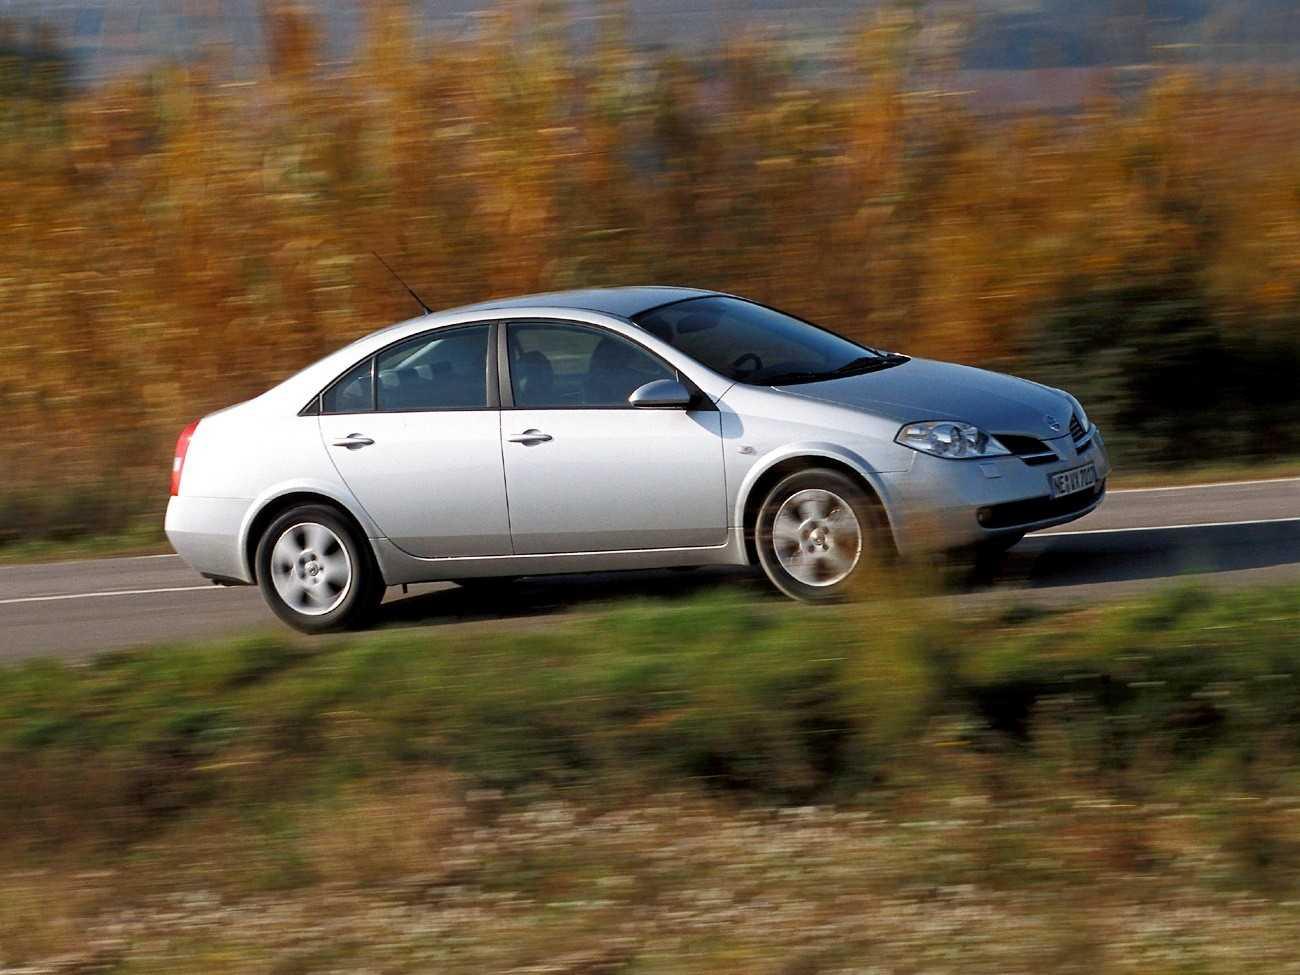 Видео краш- тестов автомобилей Nissan Primera